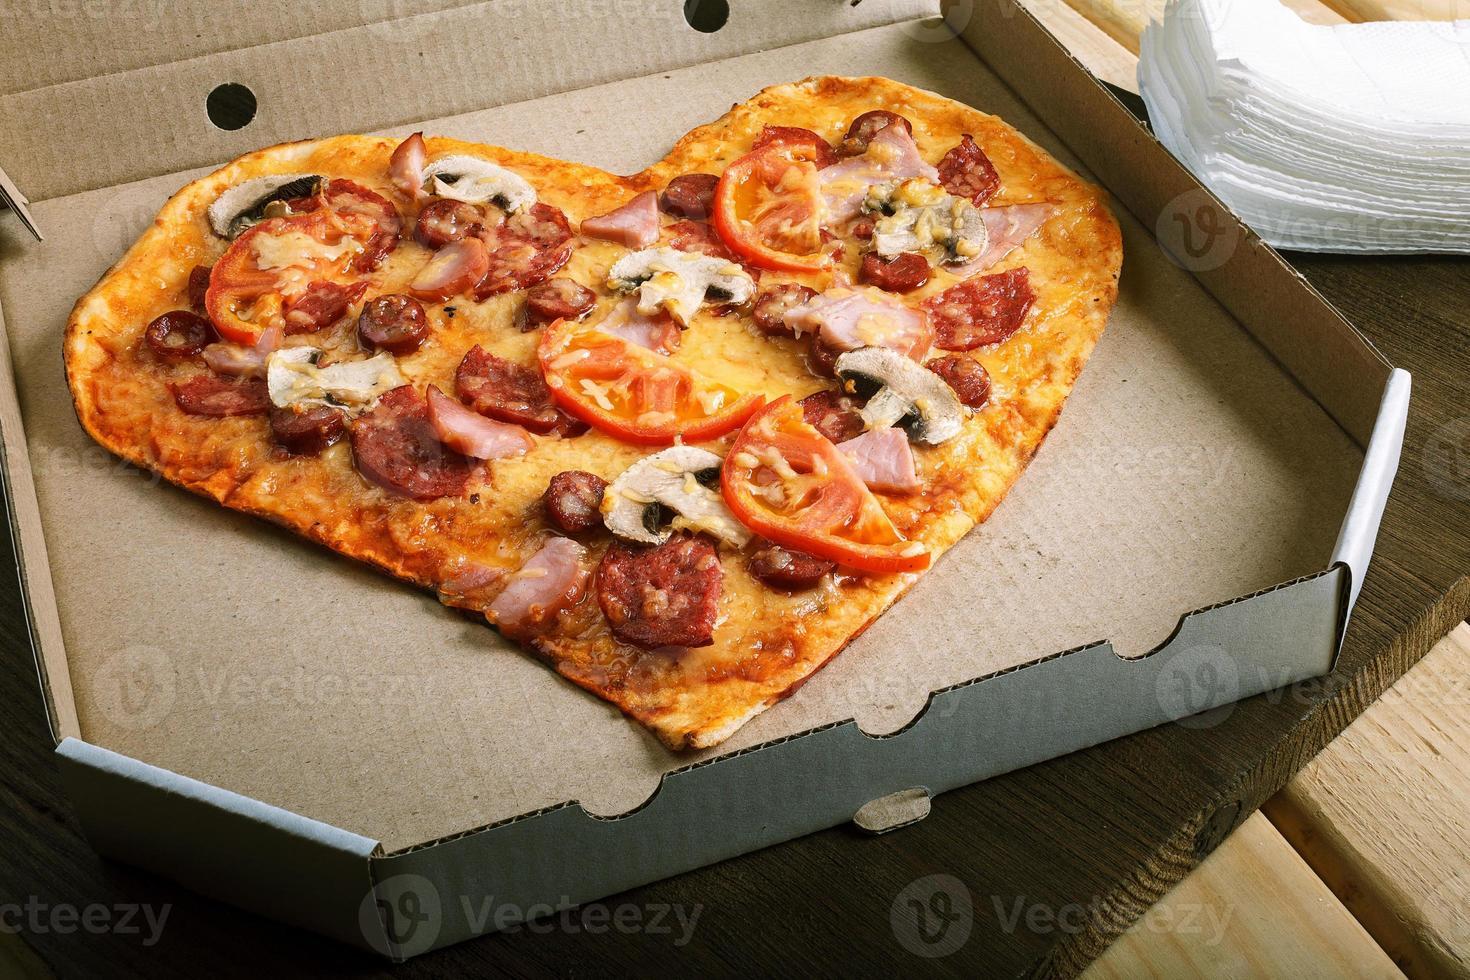 Pizza en forma de corazón sobre fondo oscuro de madera vista superior foto